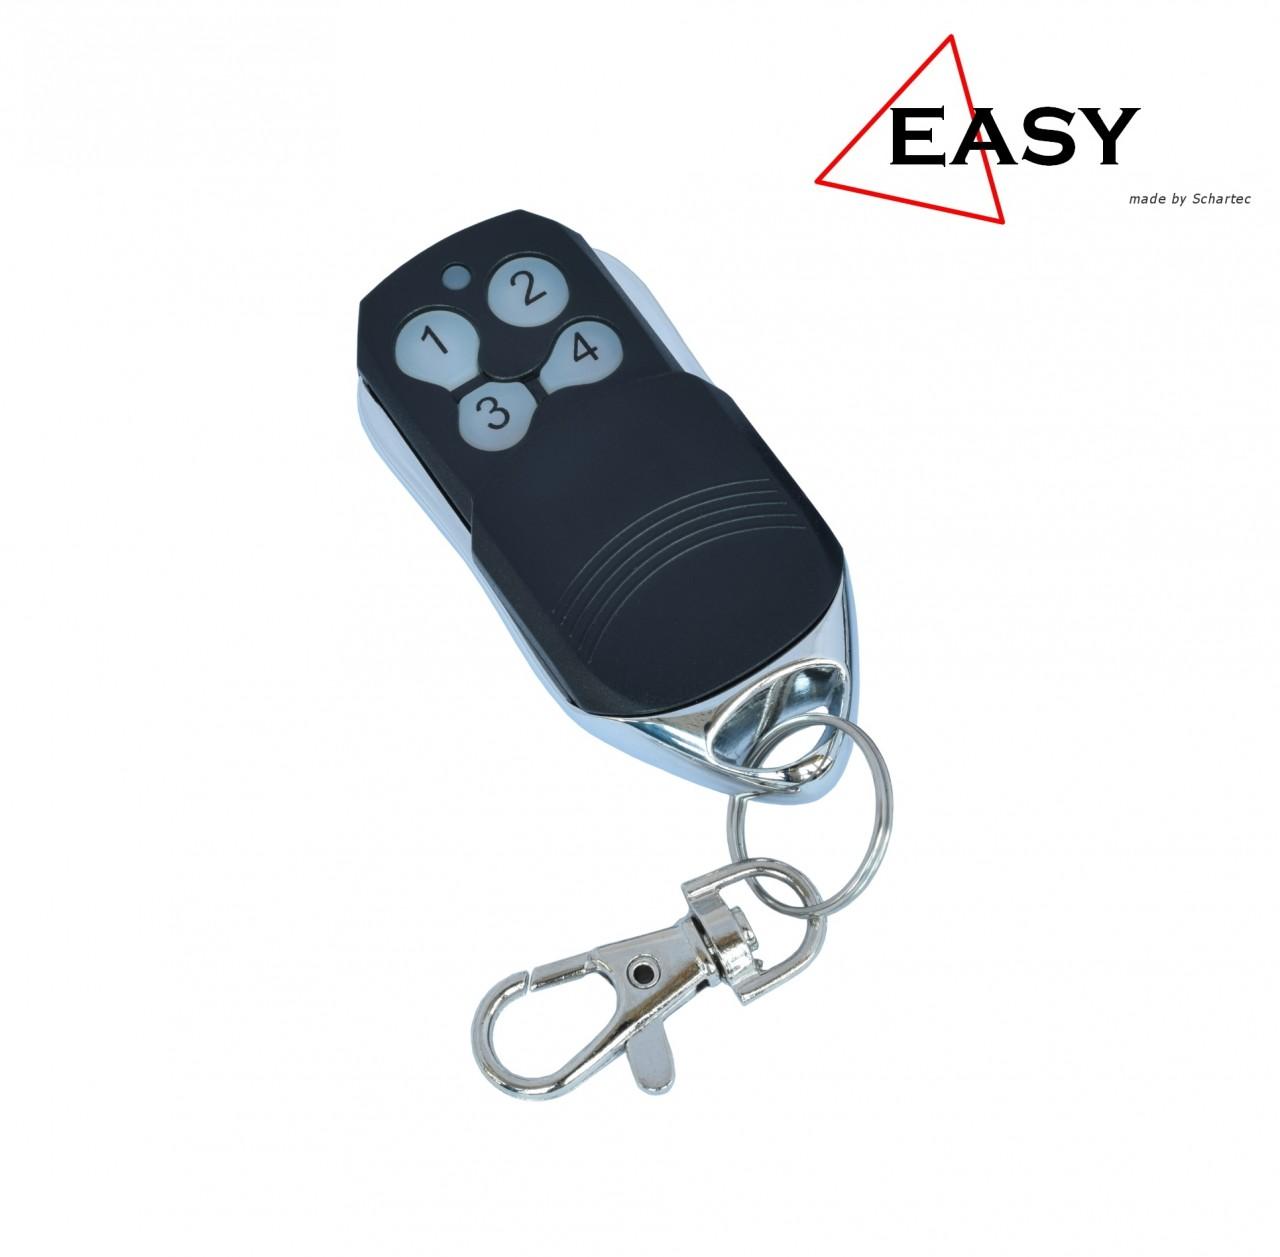 Handsender Easy